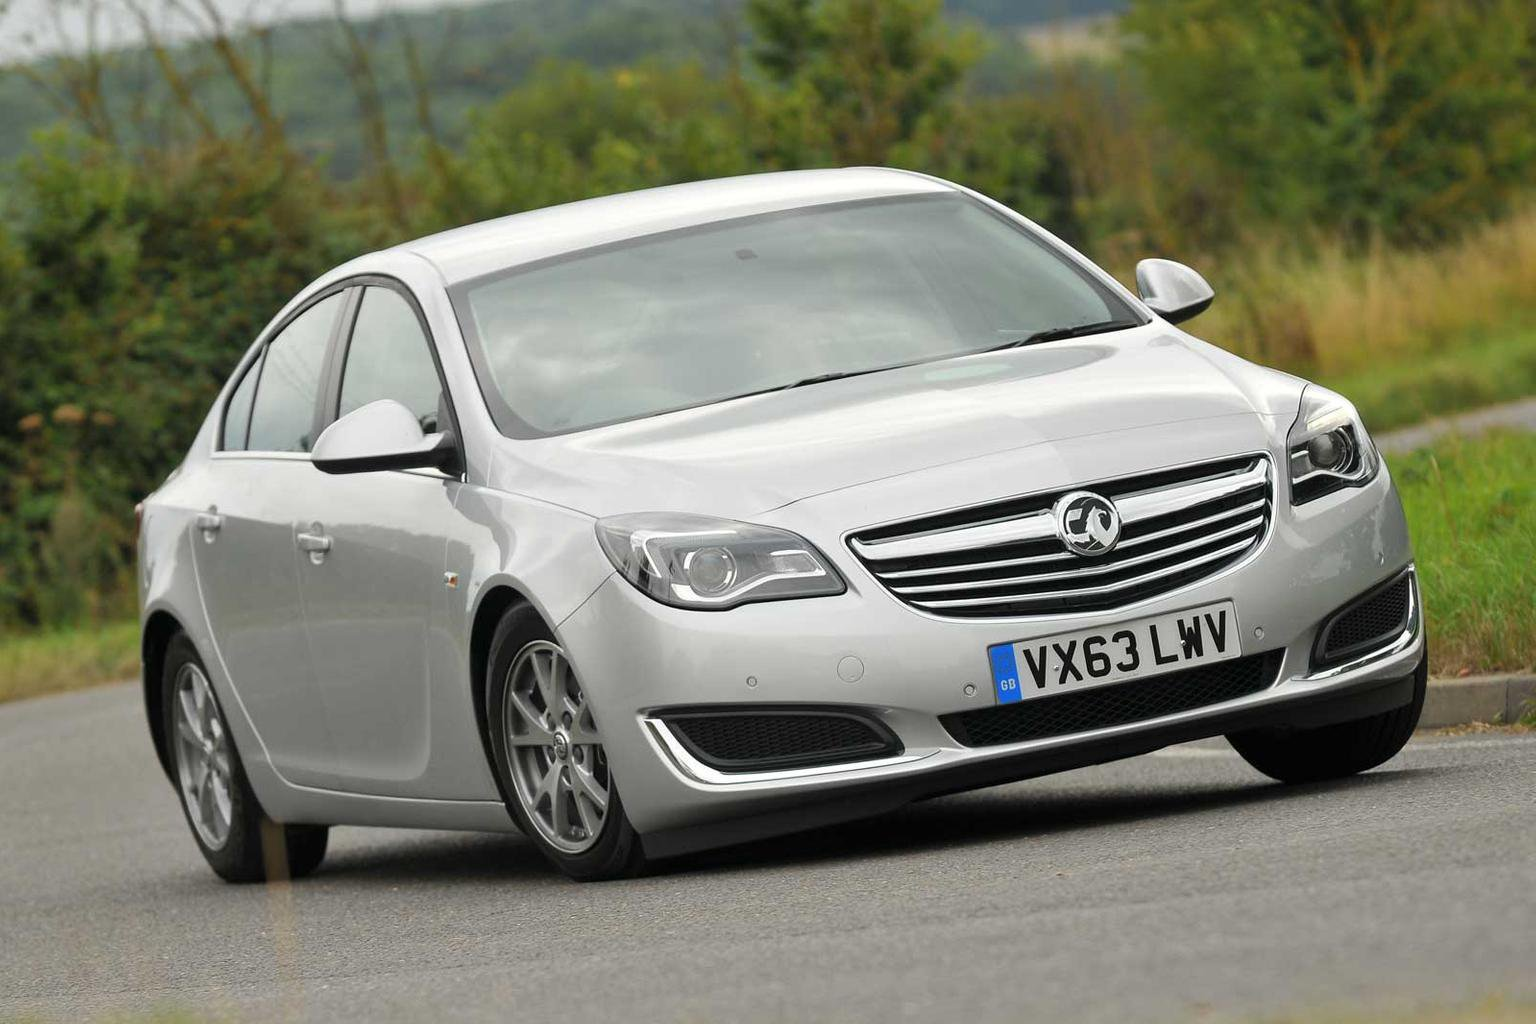 Opel insignia (опель инсигния спортс турер) универсал / business edition 2.0 / 160л.с. / автомат(6ст.) / передний привод